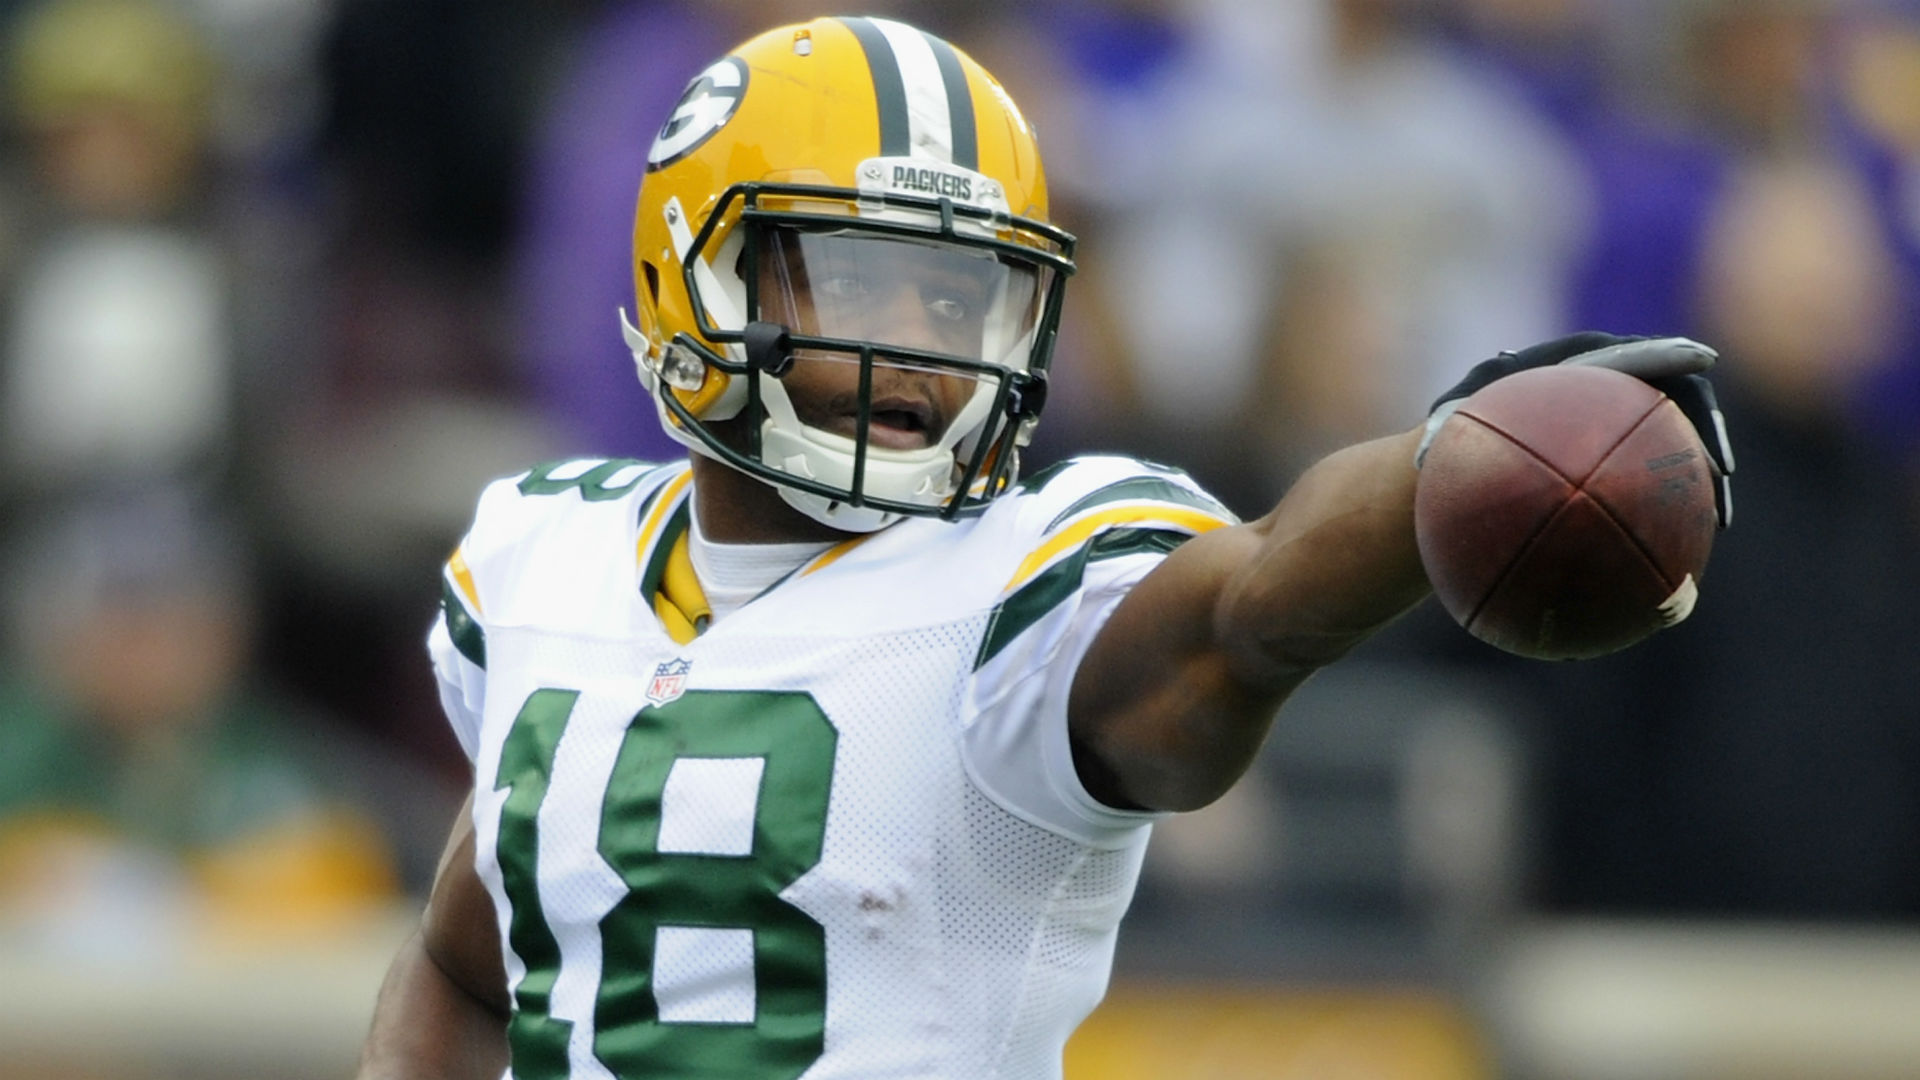 randall cobb wallpaper  Packers Randall Cobb Signing | Mayfield Sports Marketing